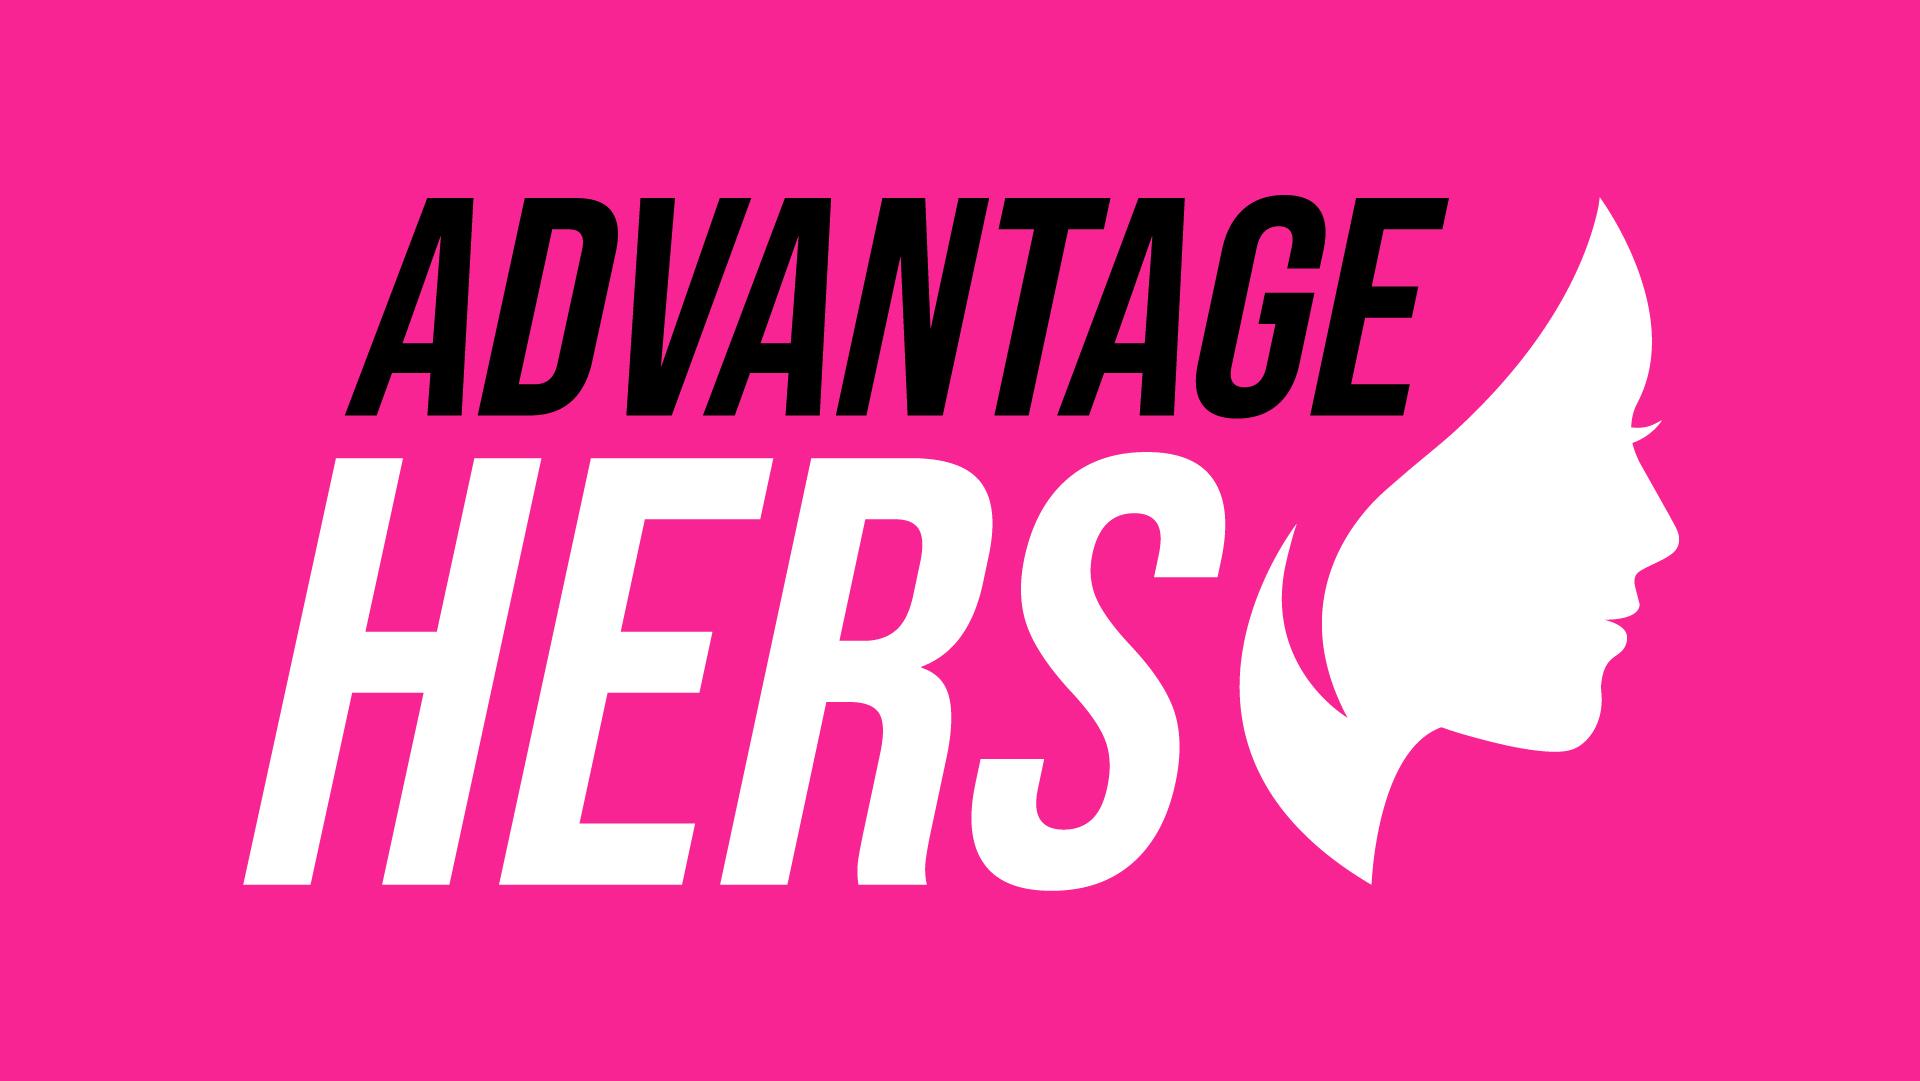 AdvantageHers FinalLogo 03